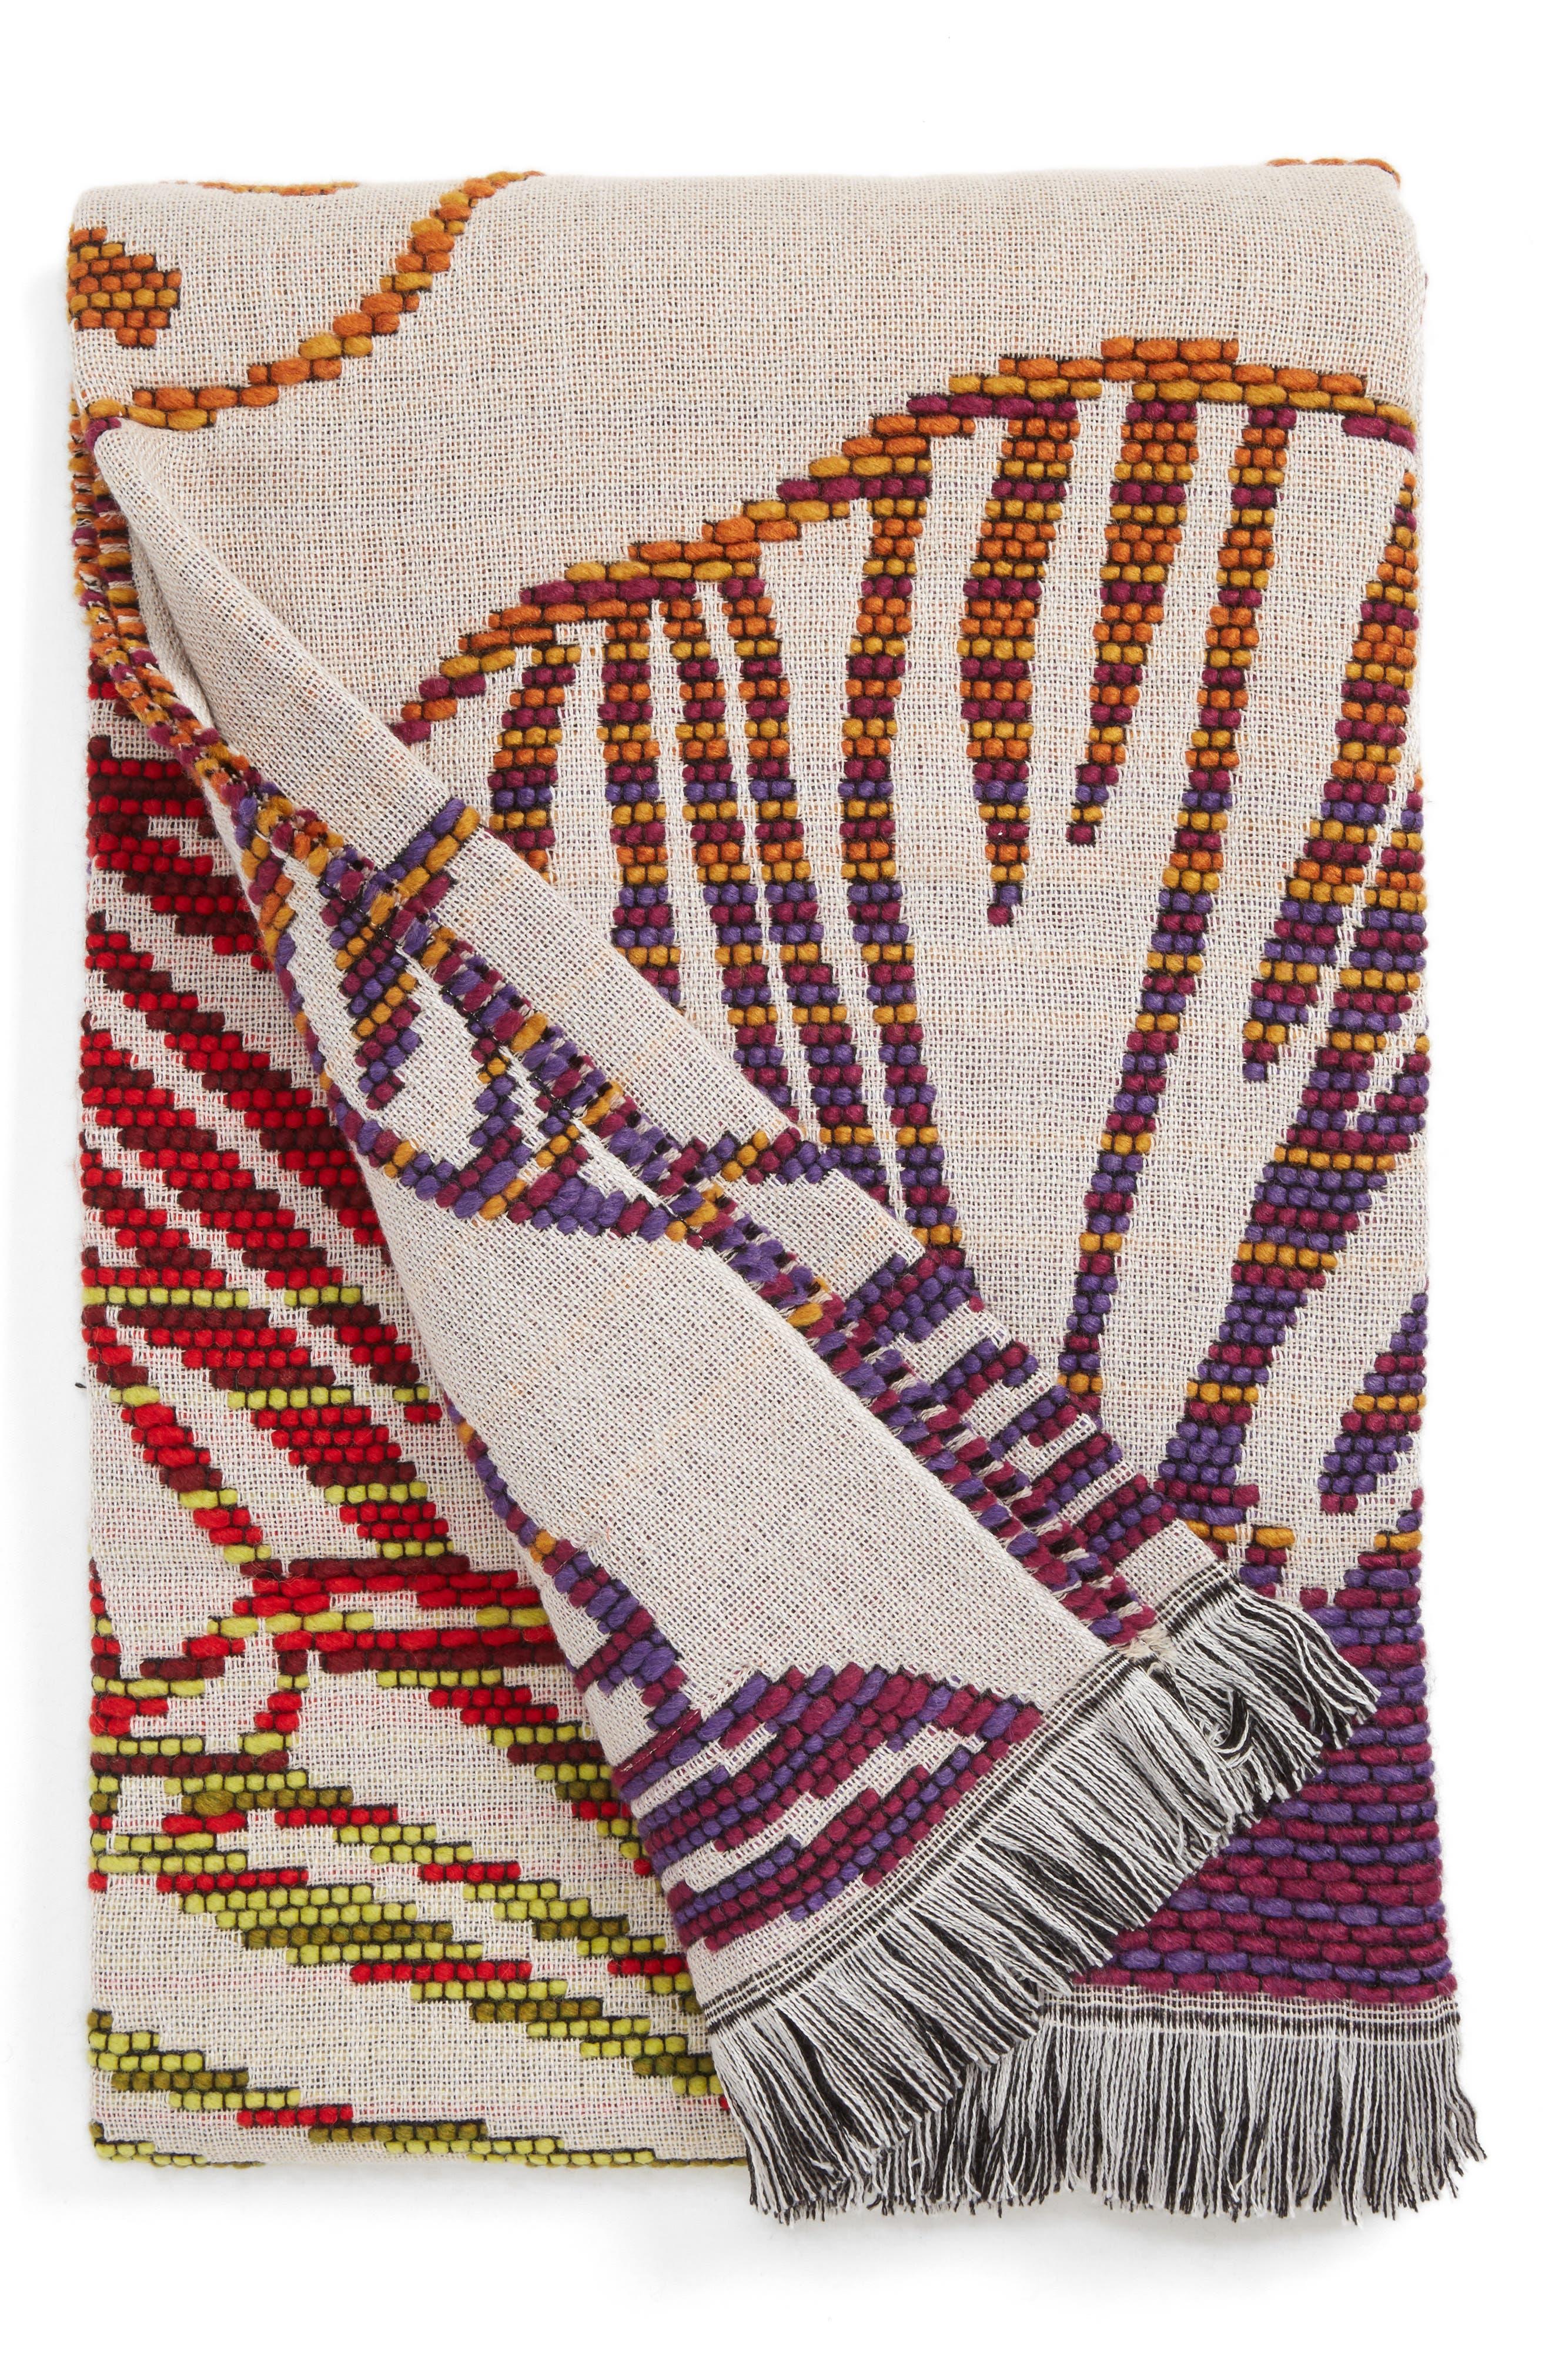 Trina Throw Blanket,                         Main,                         color, Multi Color